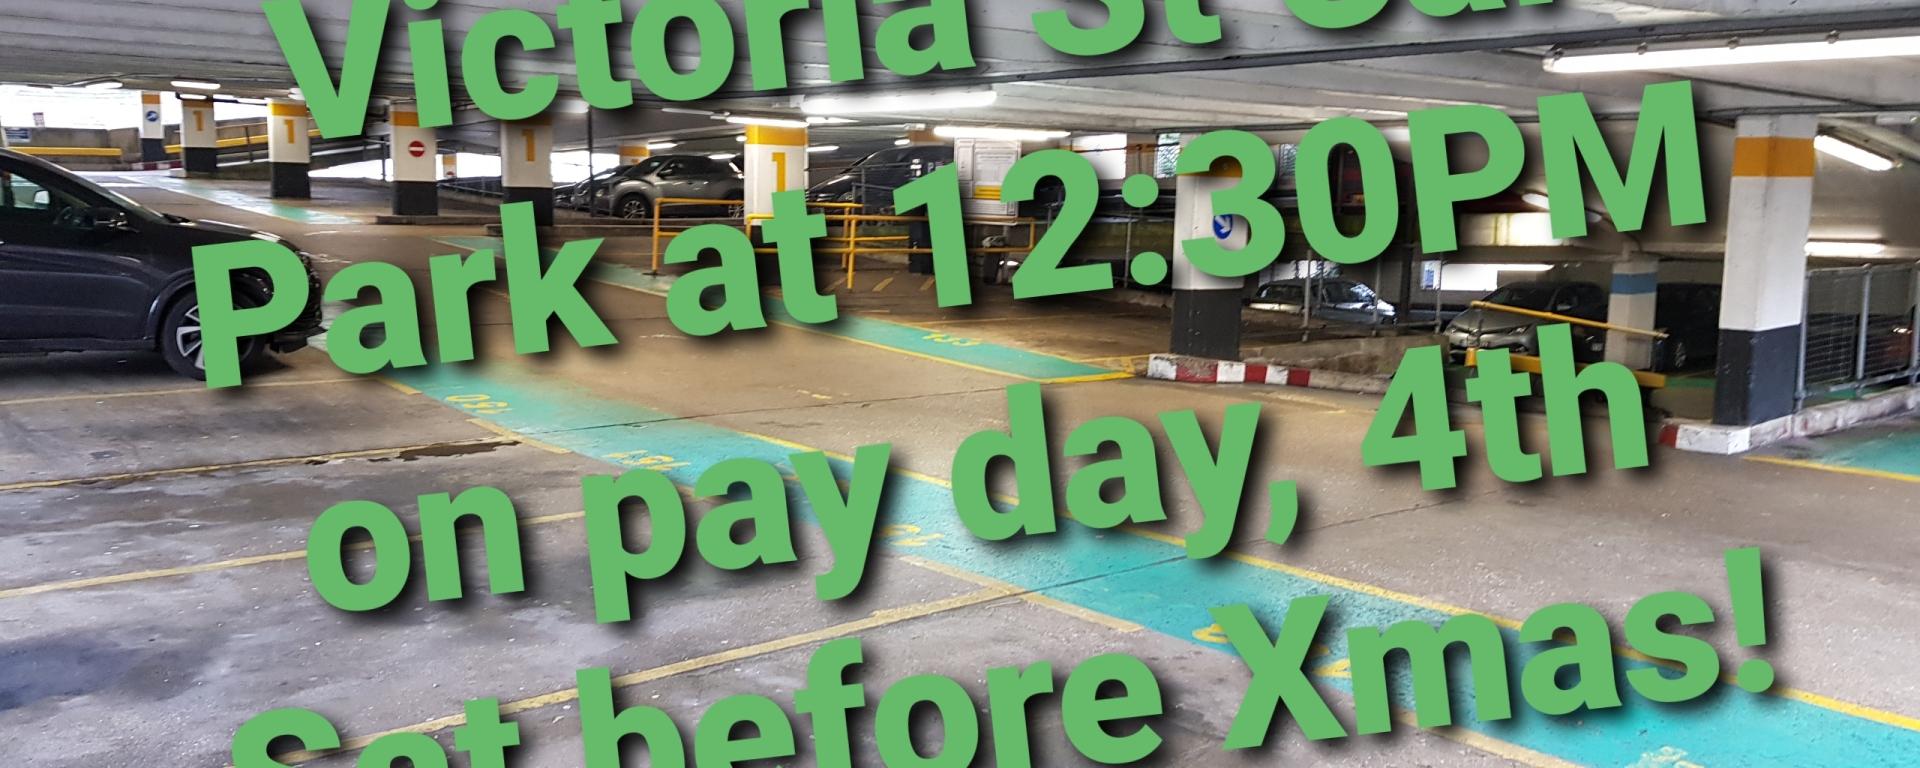 victoria car park xmas petition